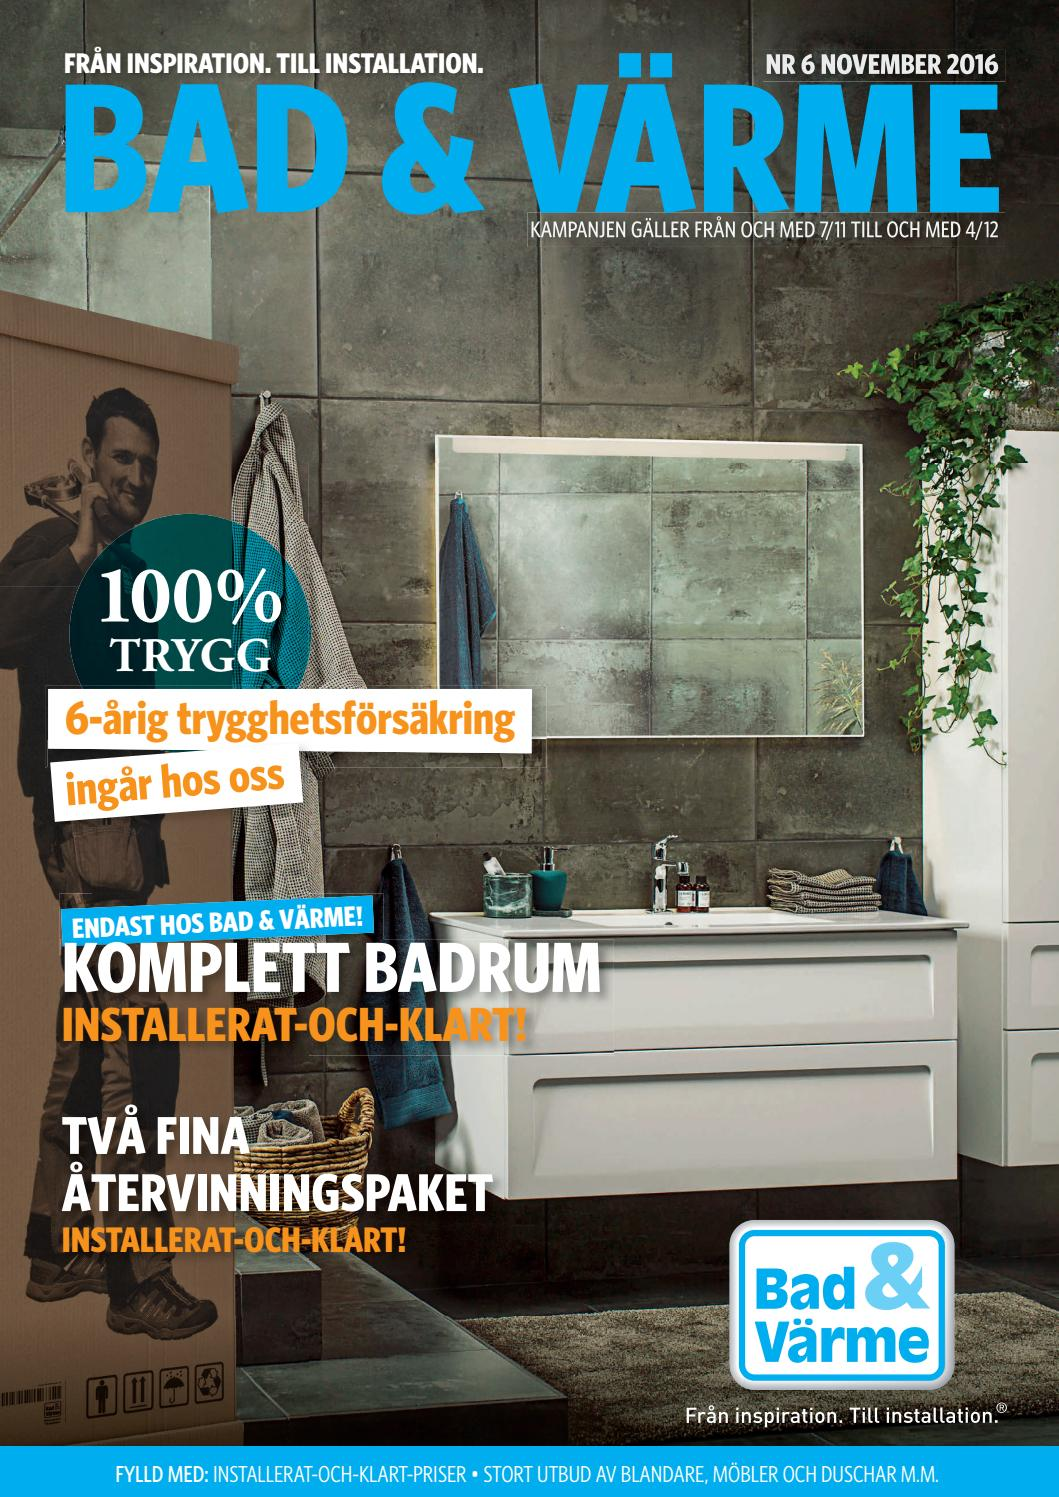 Bad&värme dr 6 2016 by kw reklam   issuu